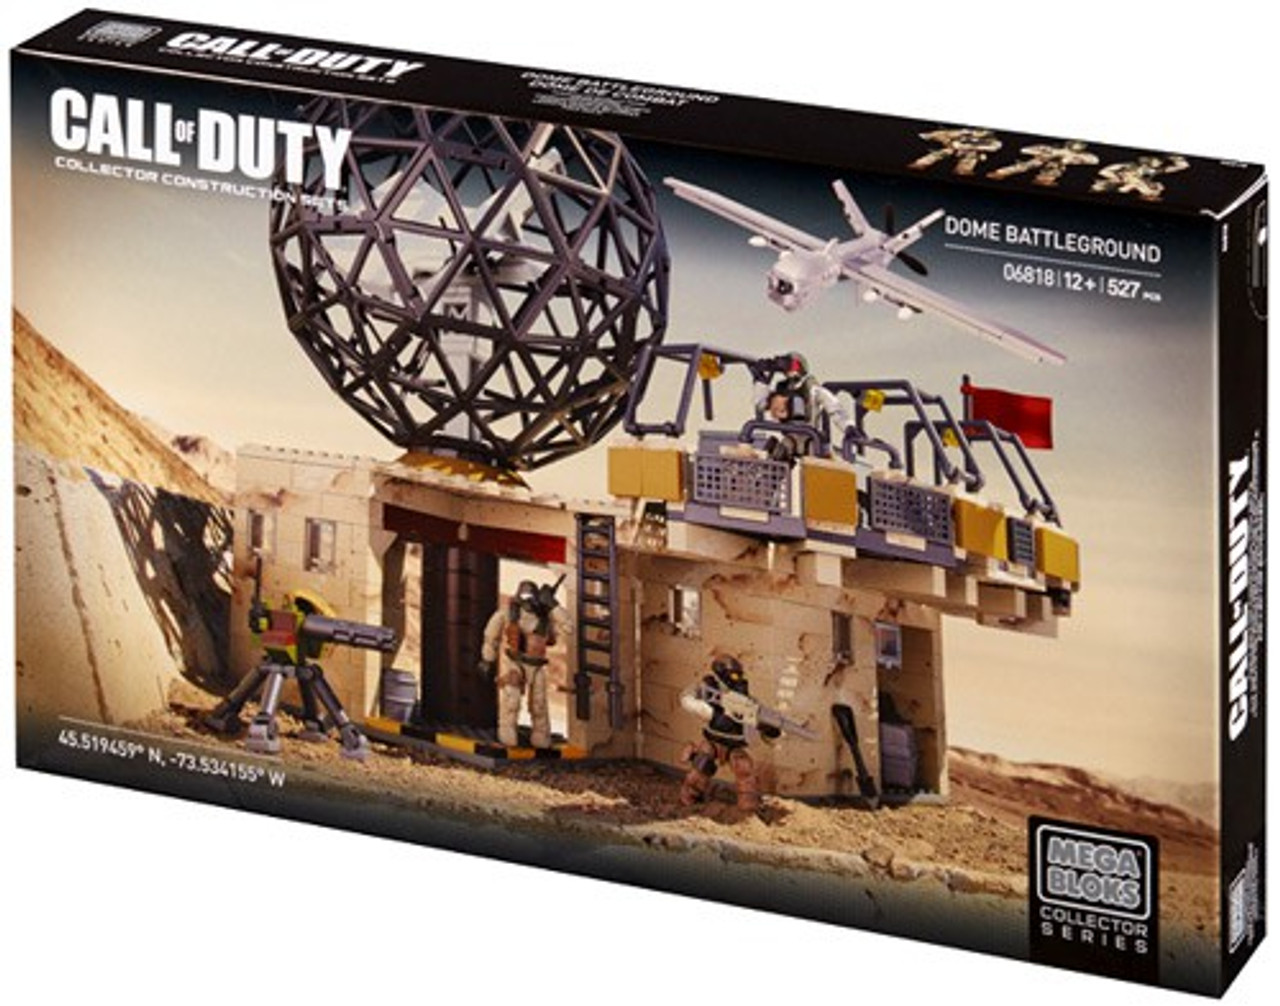 Mega Bloks Call of Duty Dome Battleground Set #06818